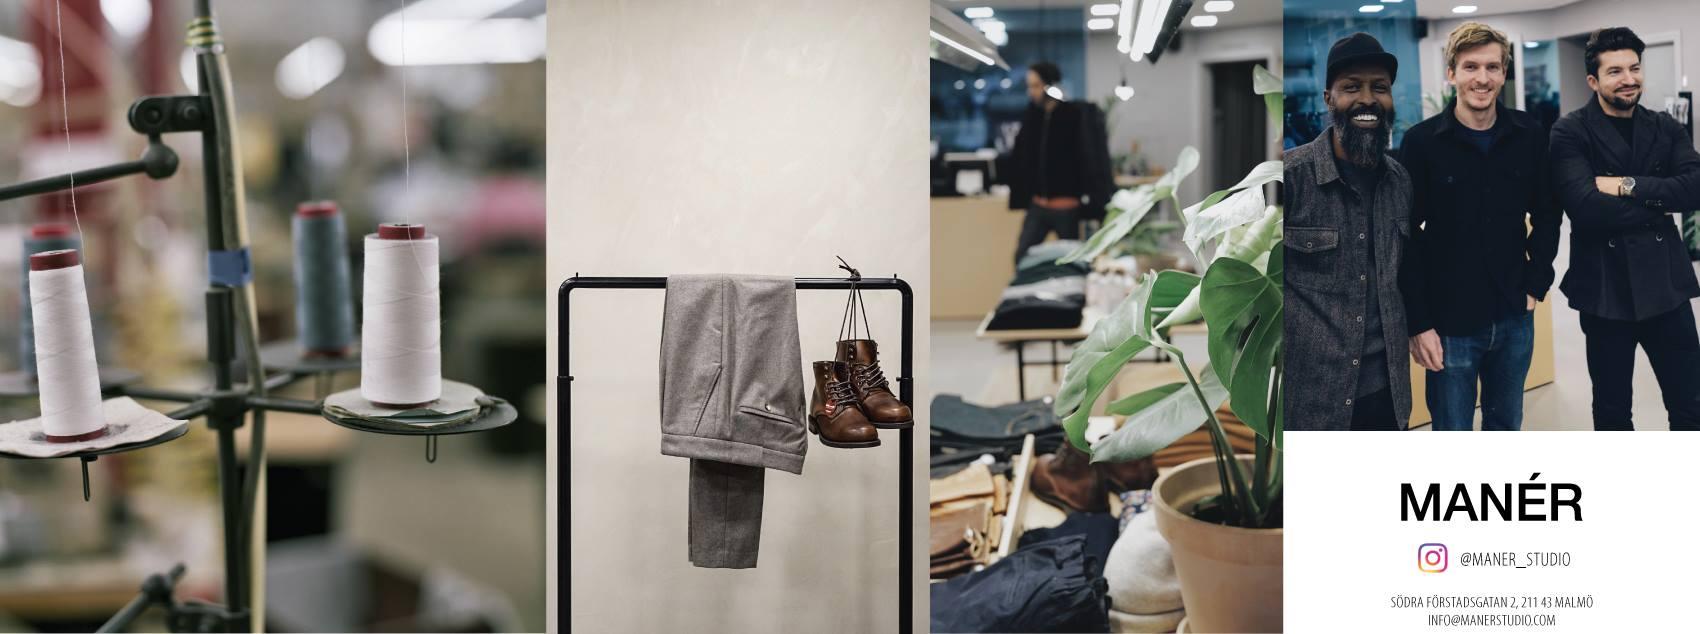 Manér Studio – Bespoke Jeans made in Malmö